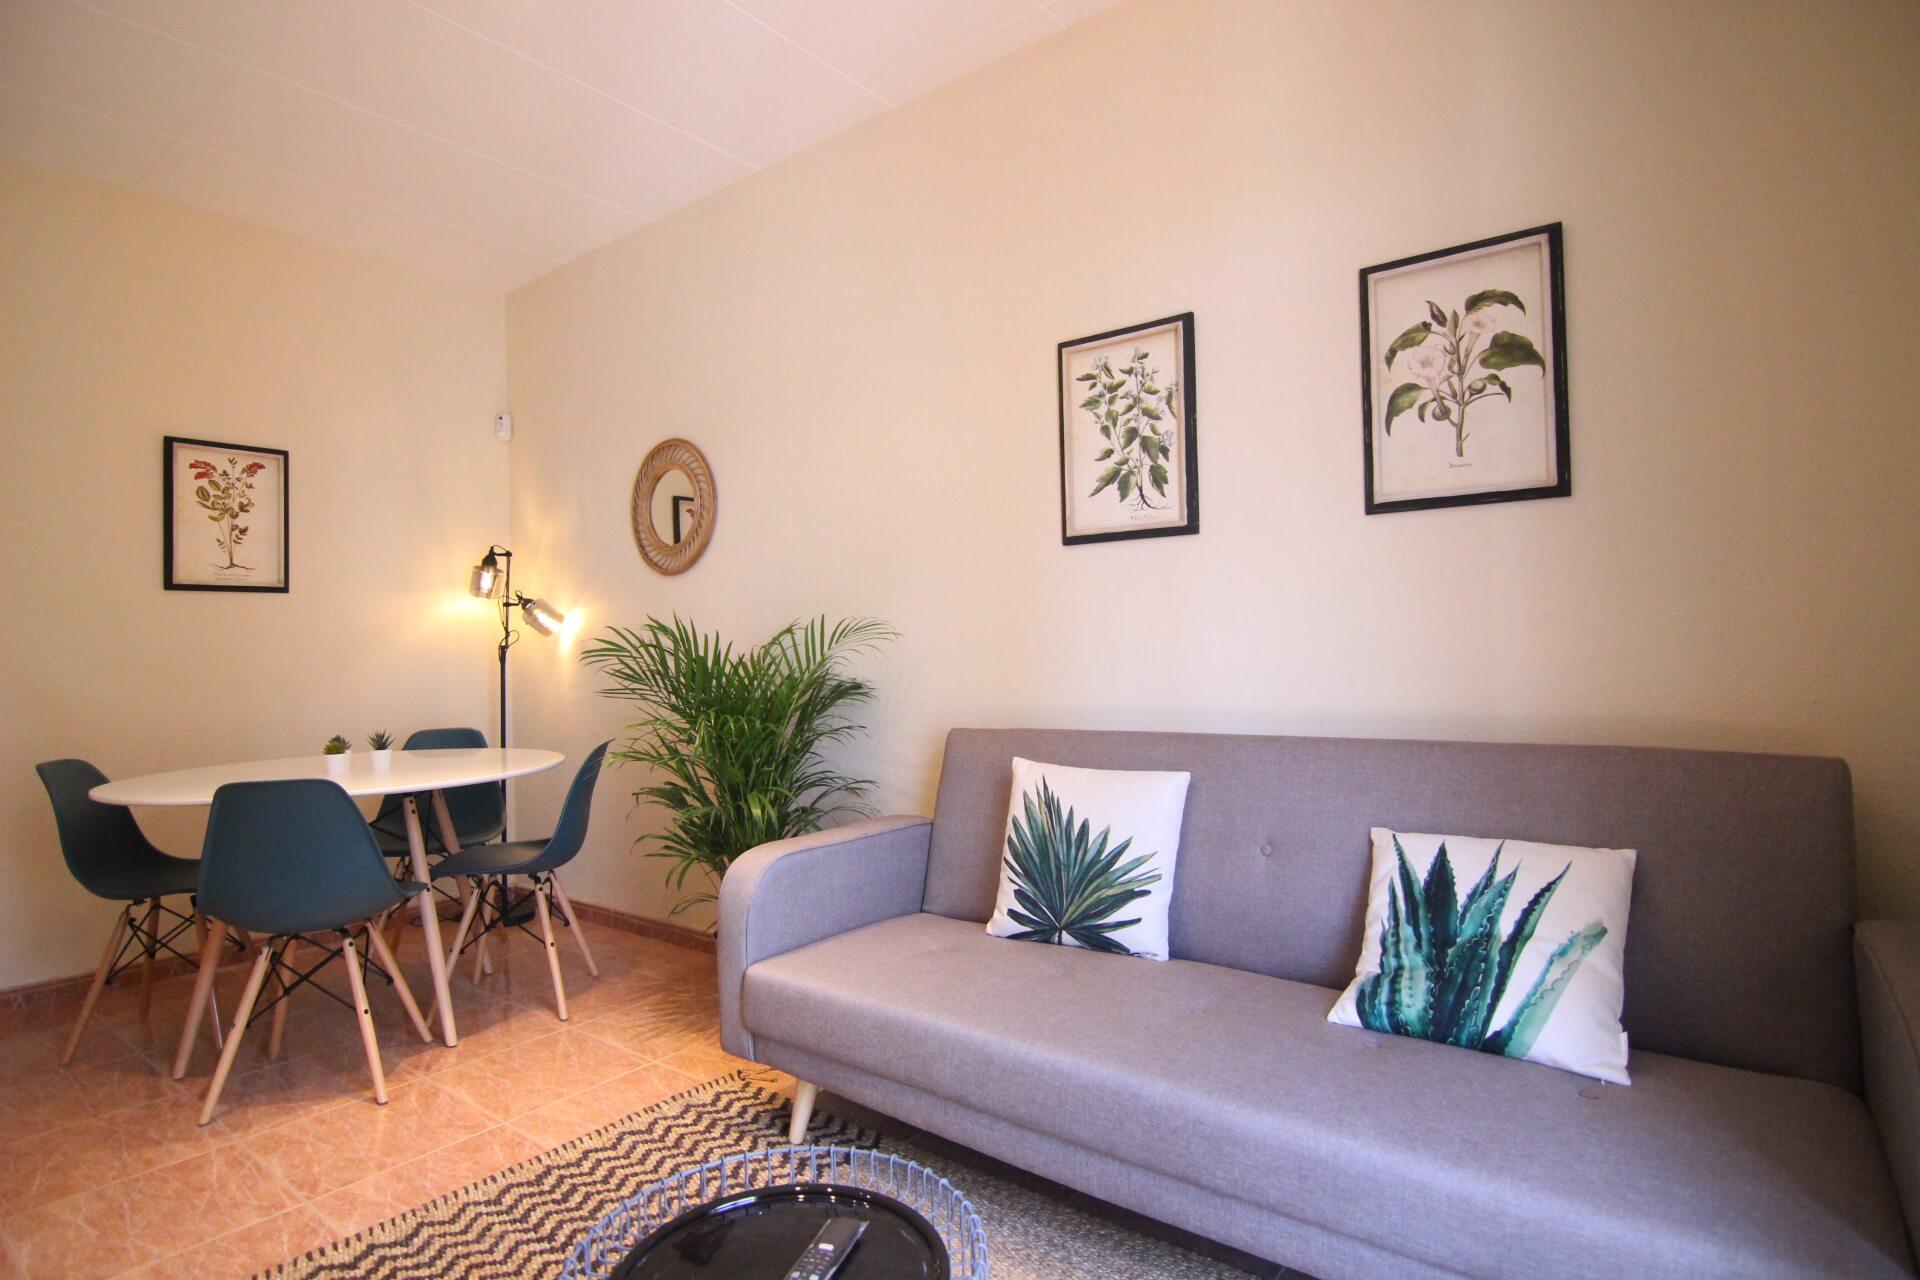 Hostafrancs Market – Sants – Calle Aliga 3 beds ( 1000 € –> 31/12/19 – 1200€ –> 01/01/20)